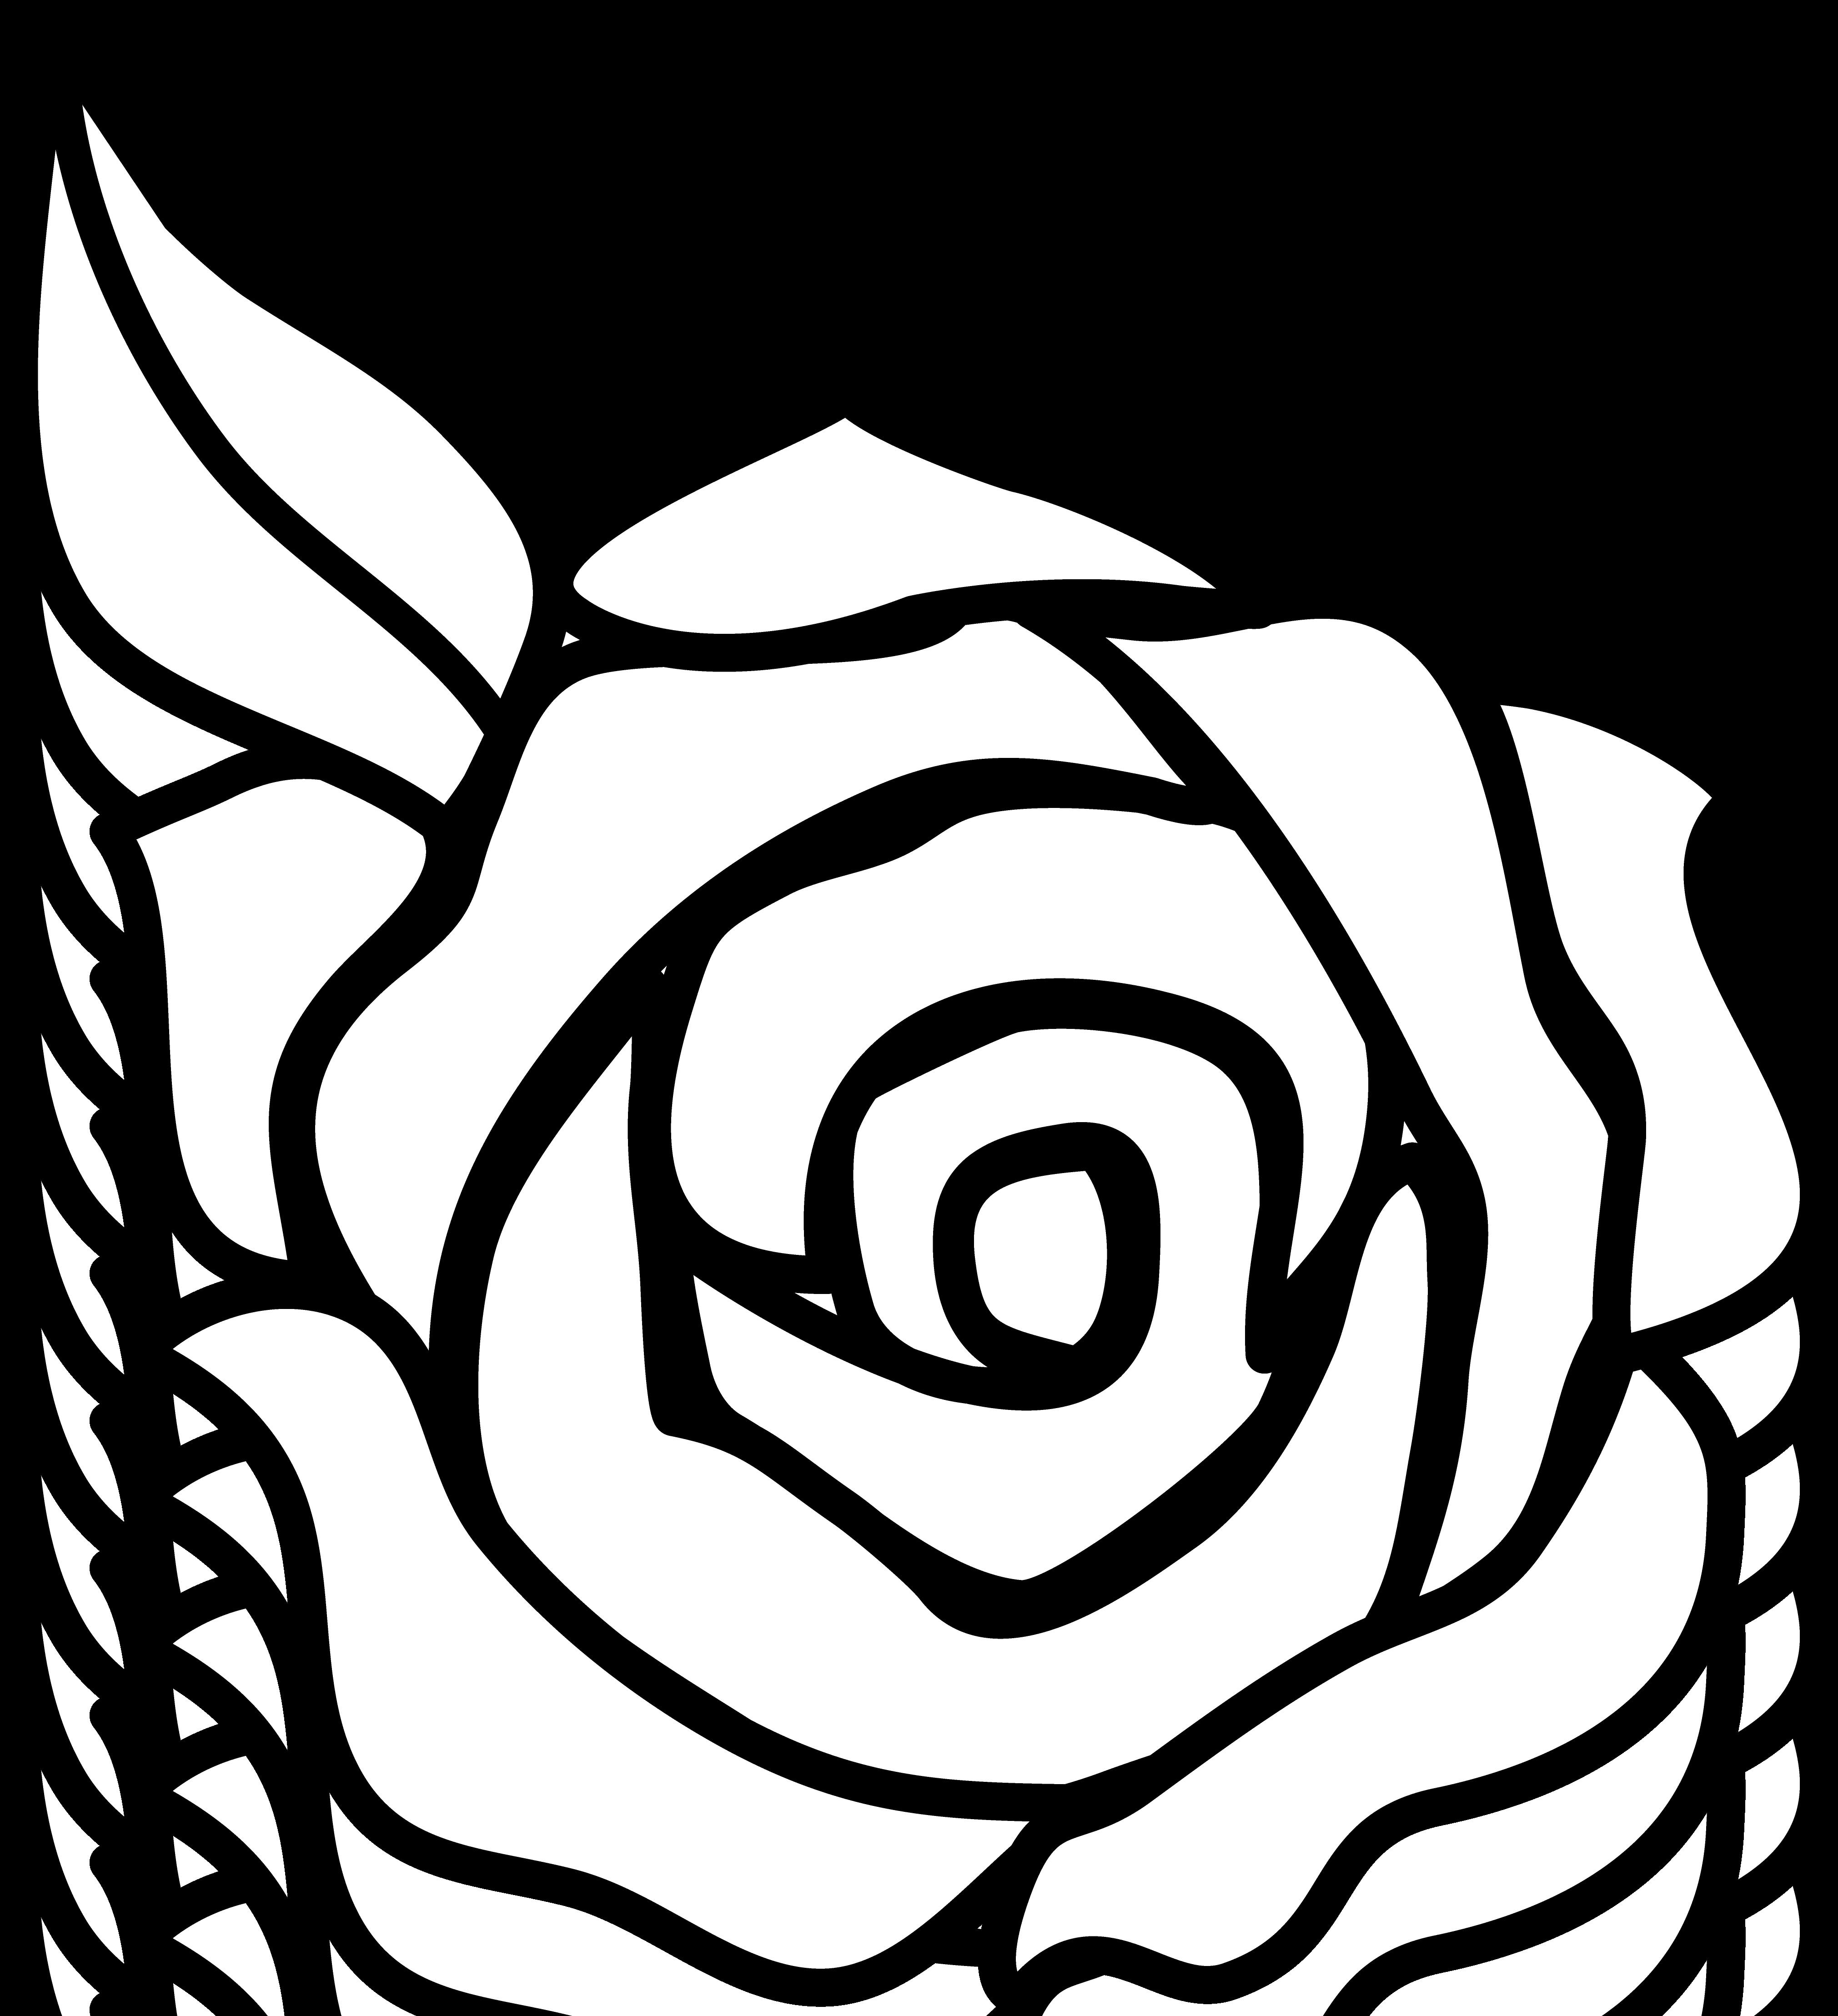 Rose Clip Art - Rose Clipart Black And White